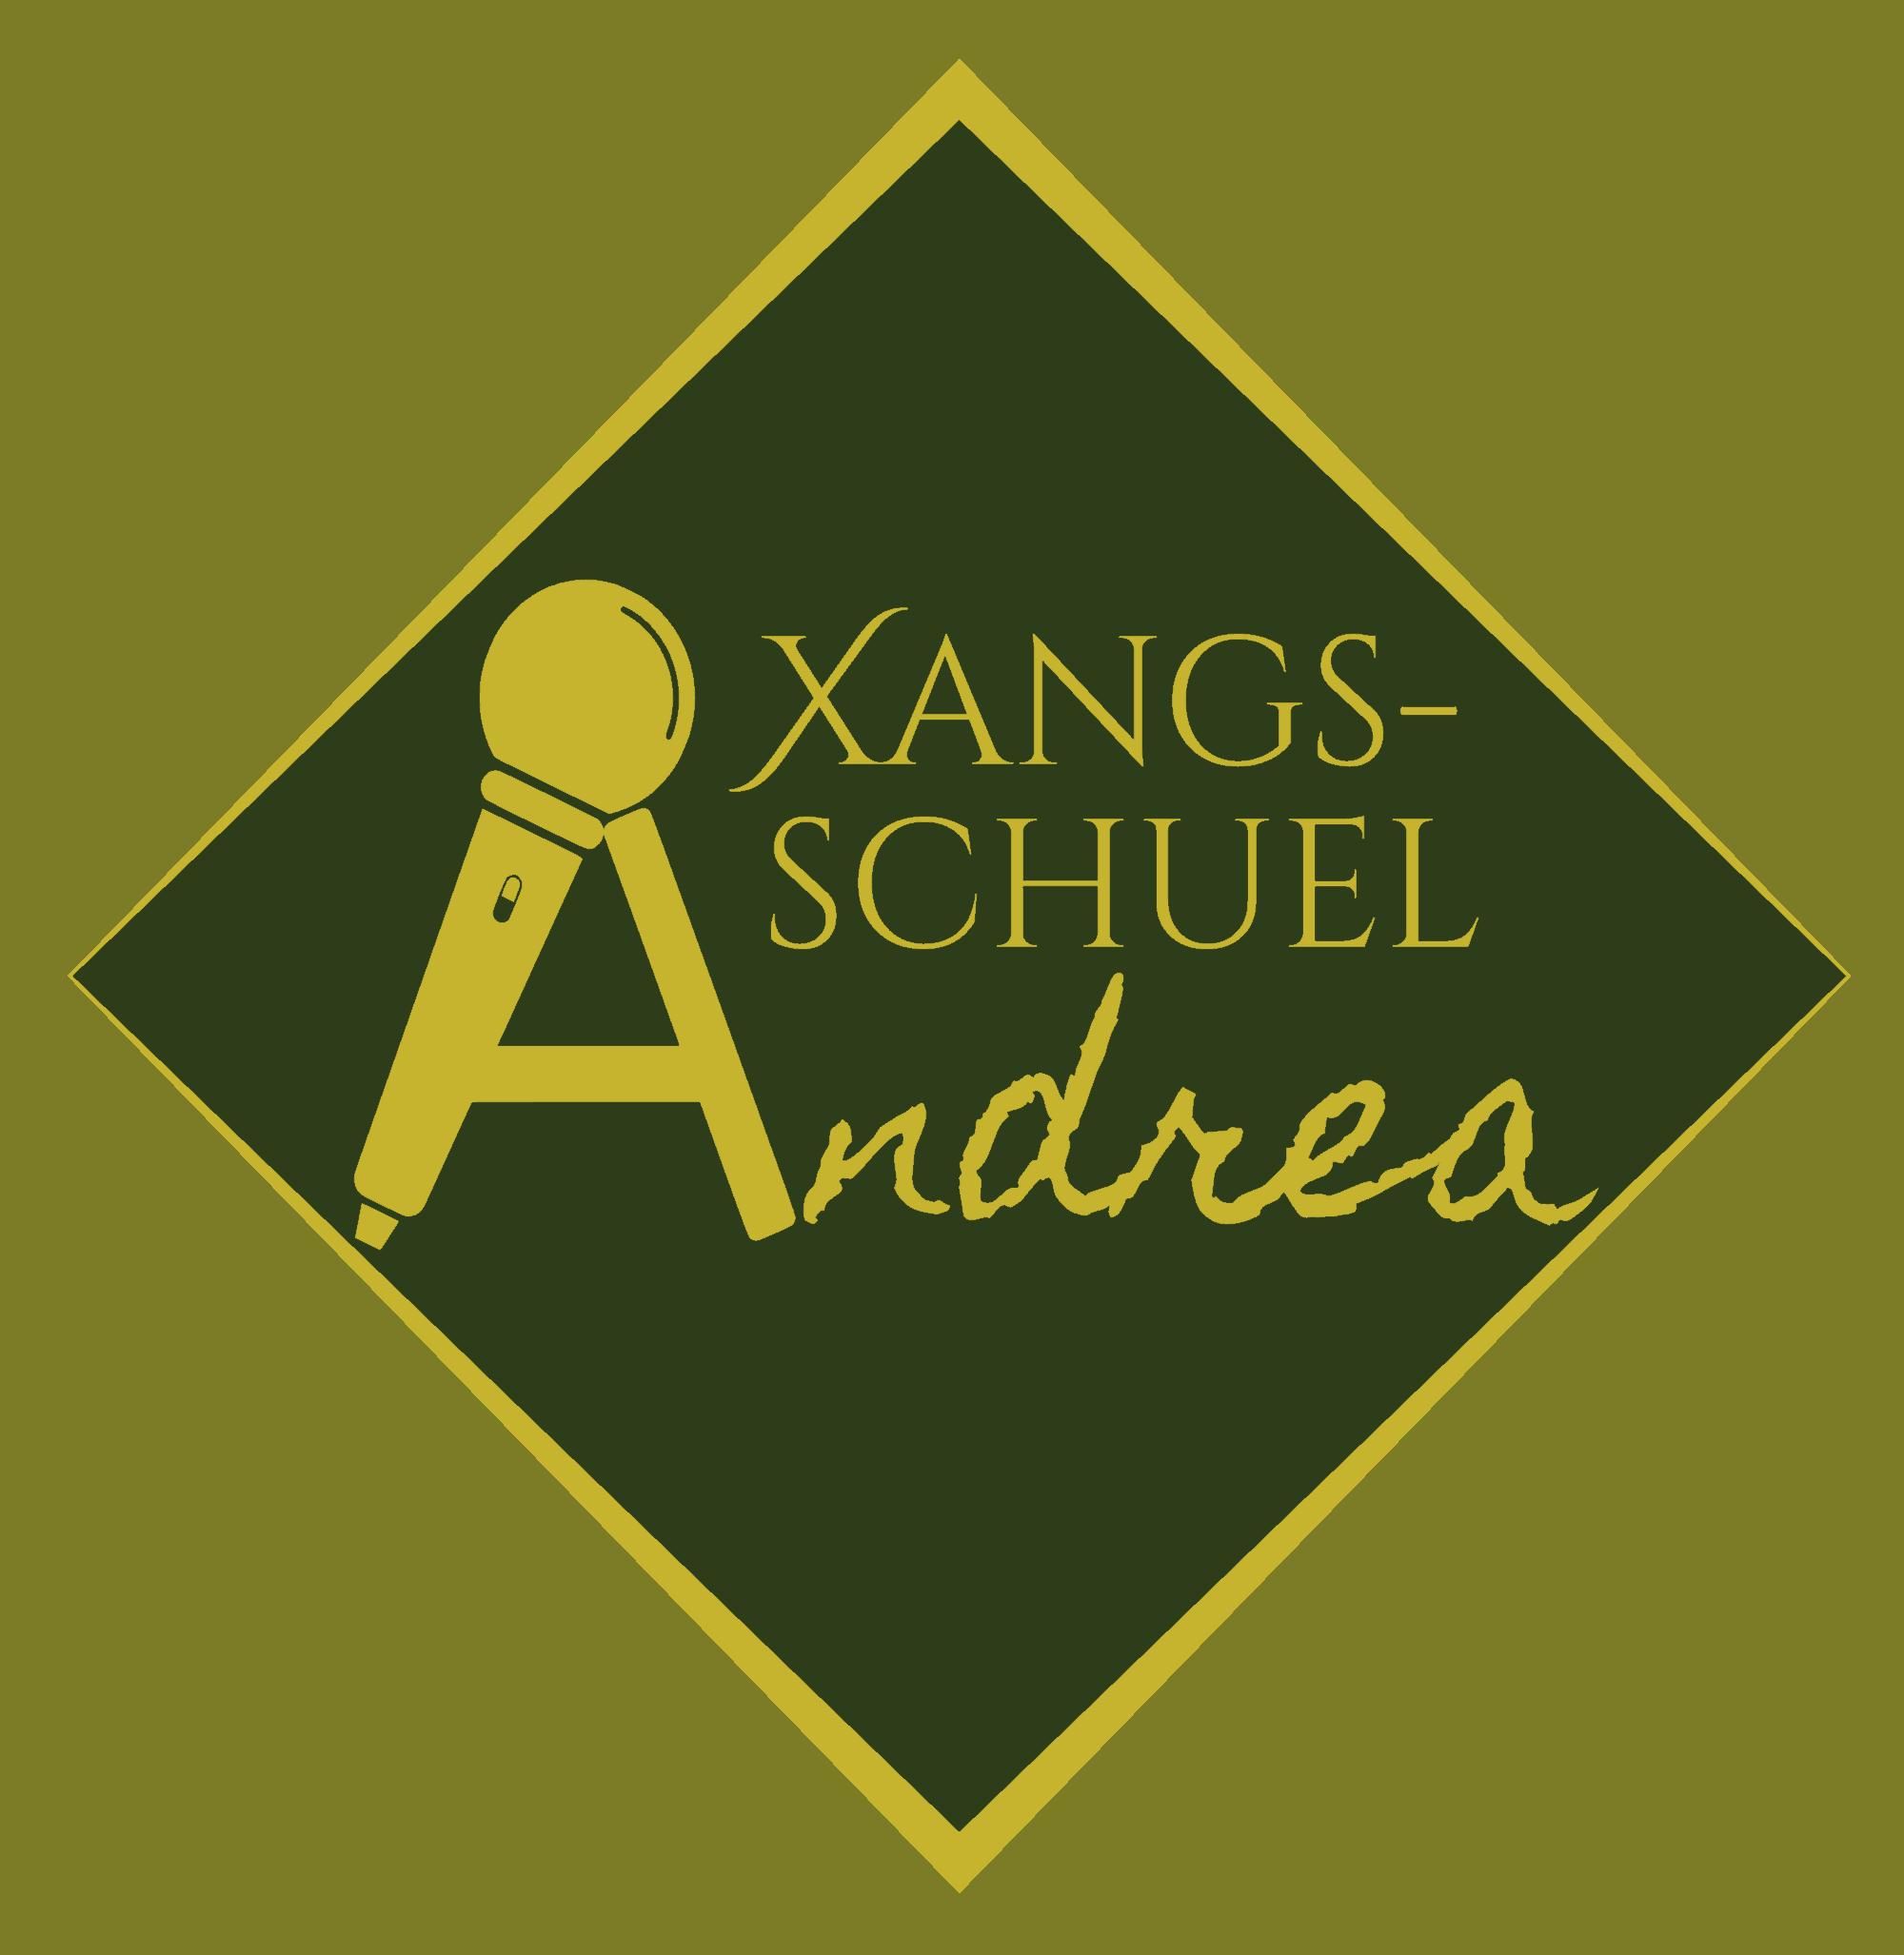 Xangsschuel Andrea